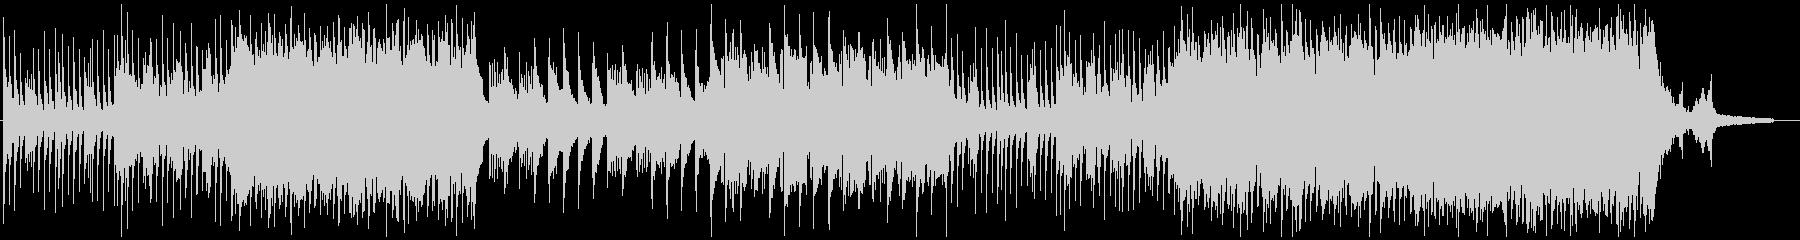 Mistrain / Jingle's unreproduced waveform